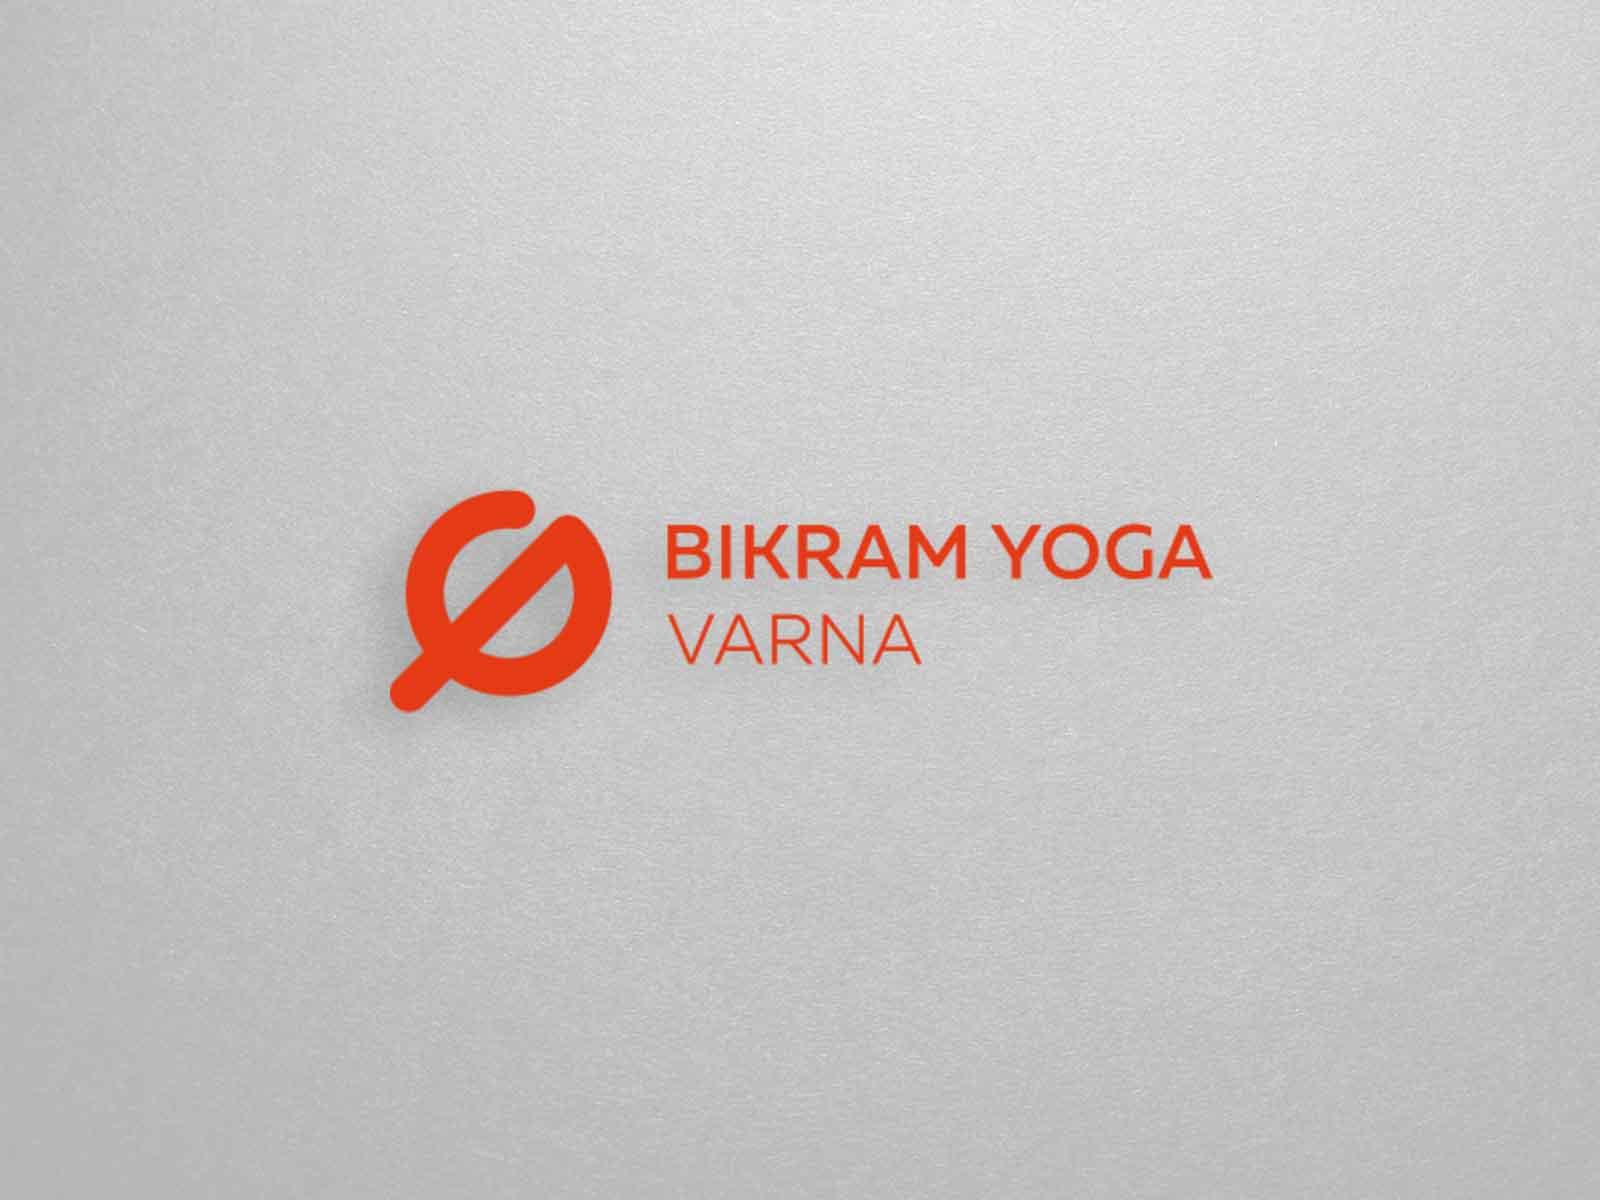 bikram-logo